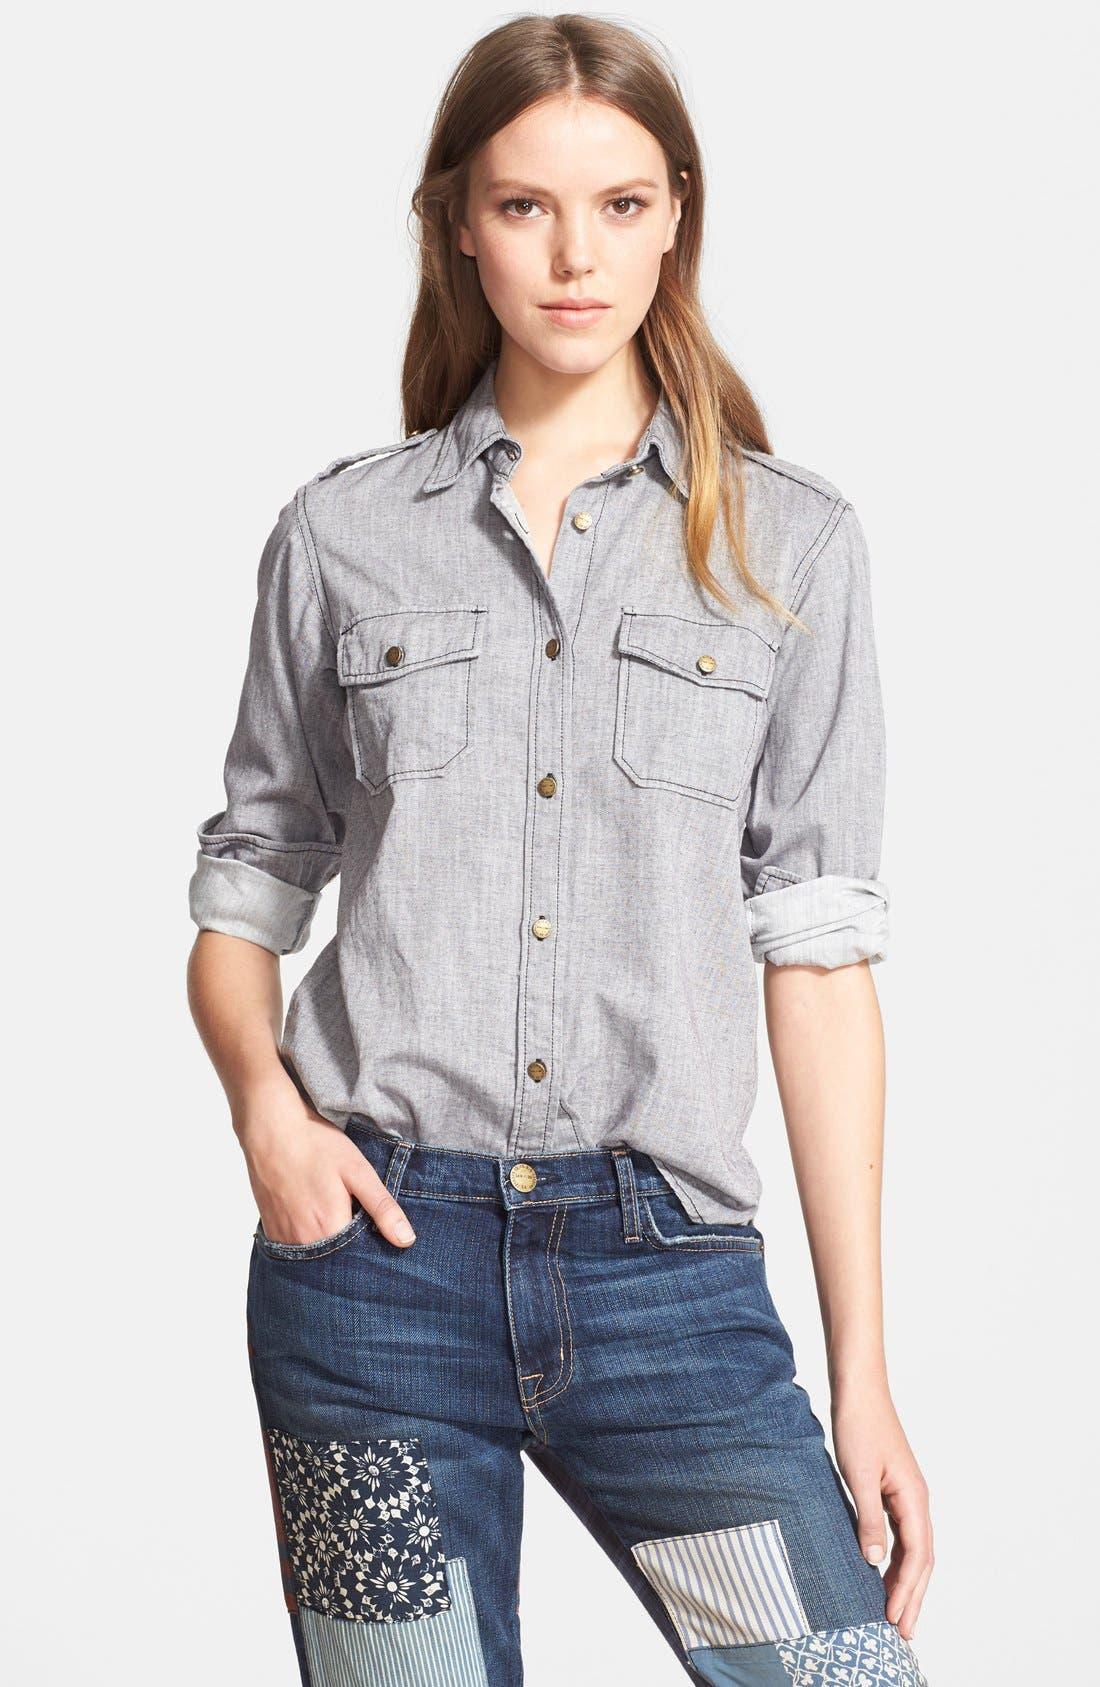 Alternate Image 1 Selected - Current/Elliott 'The Perfect Shirt' Cotton Shirt